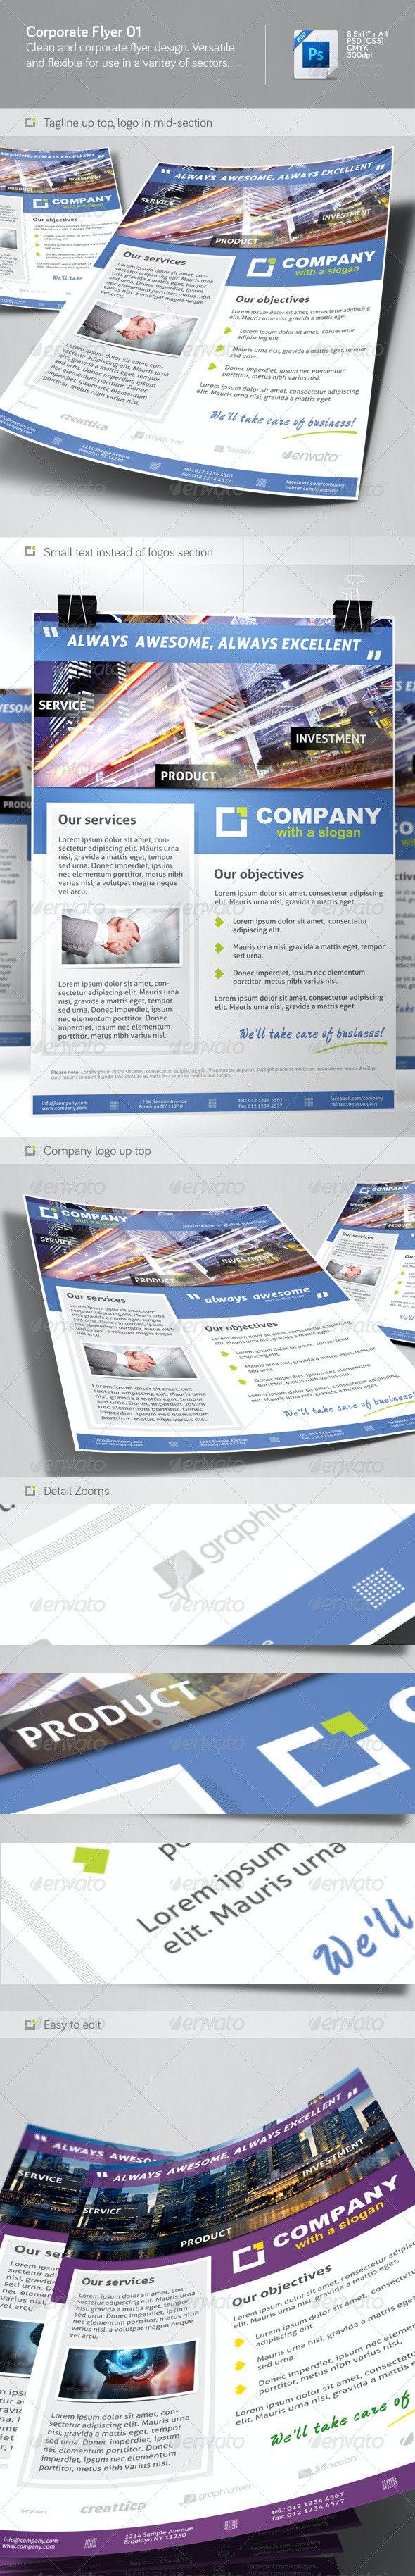 Corporate Flyer 01 - Corporate Flyers